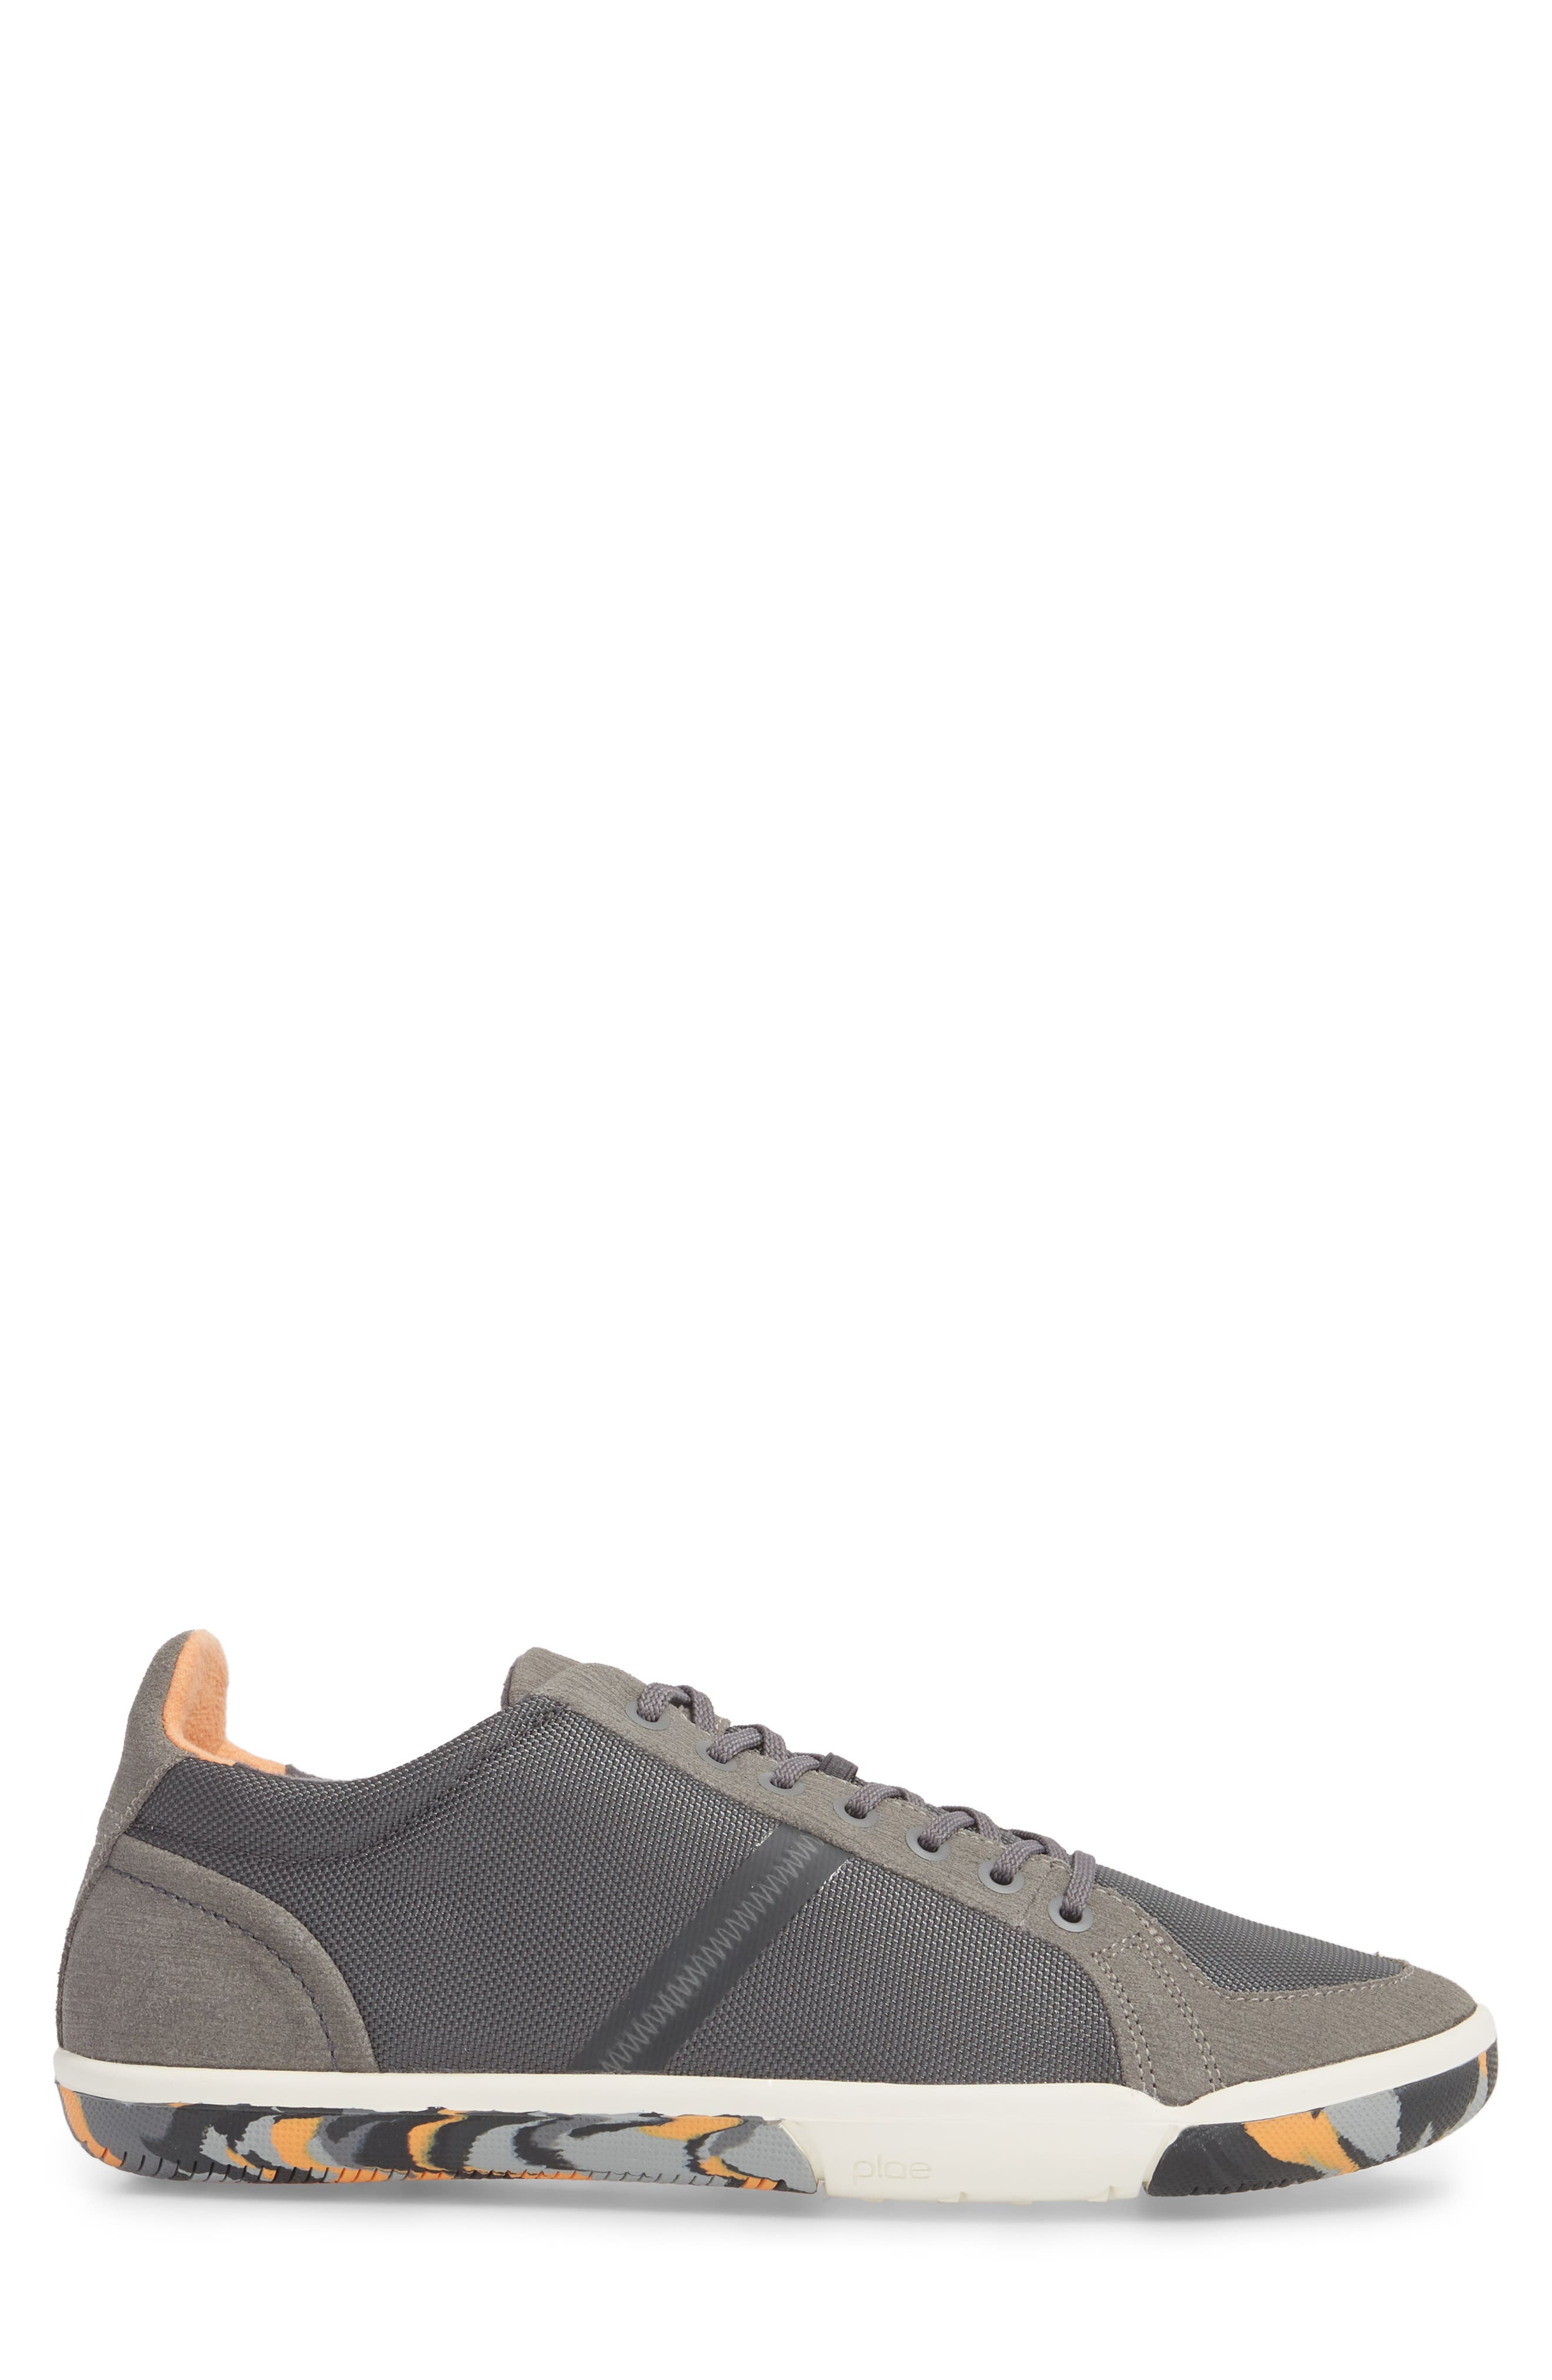 Alternate Image 3  - PLAE Prospect Low Top Sneaker (Men)